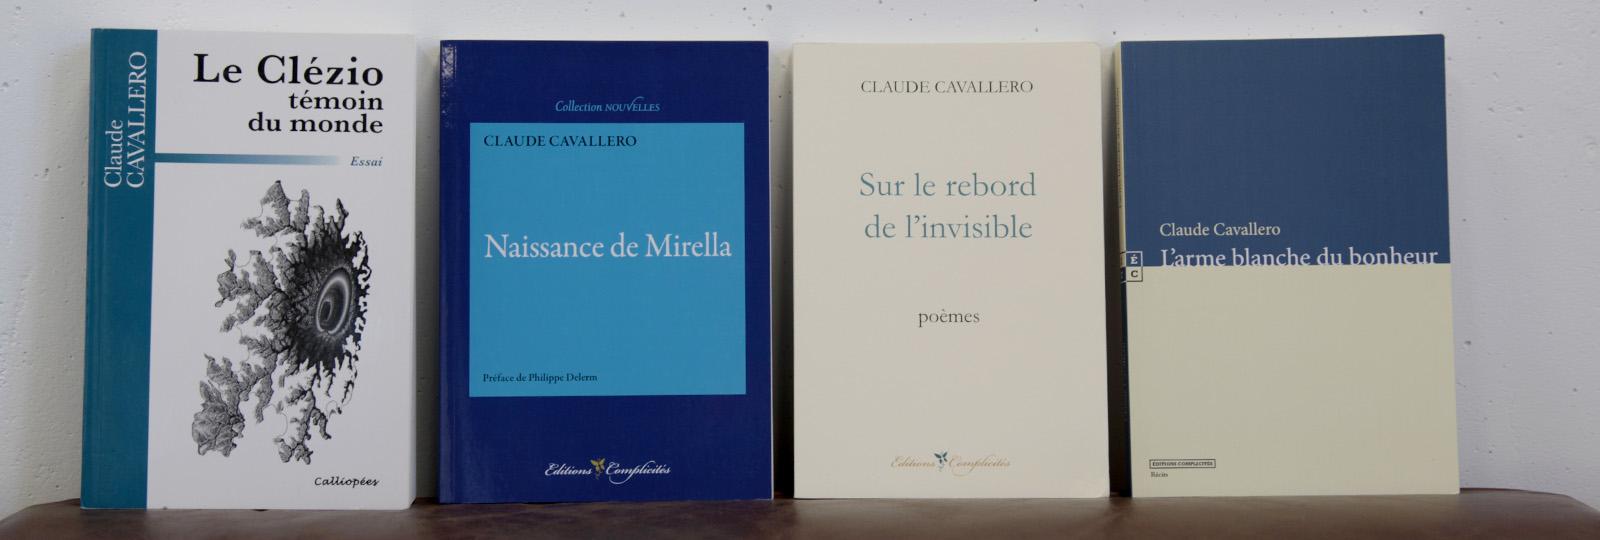 Bibliographique de Claude Cavallero